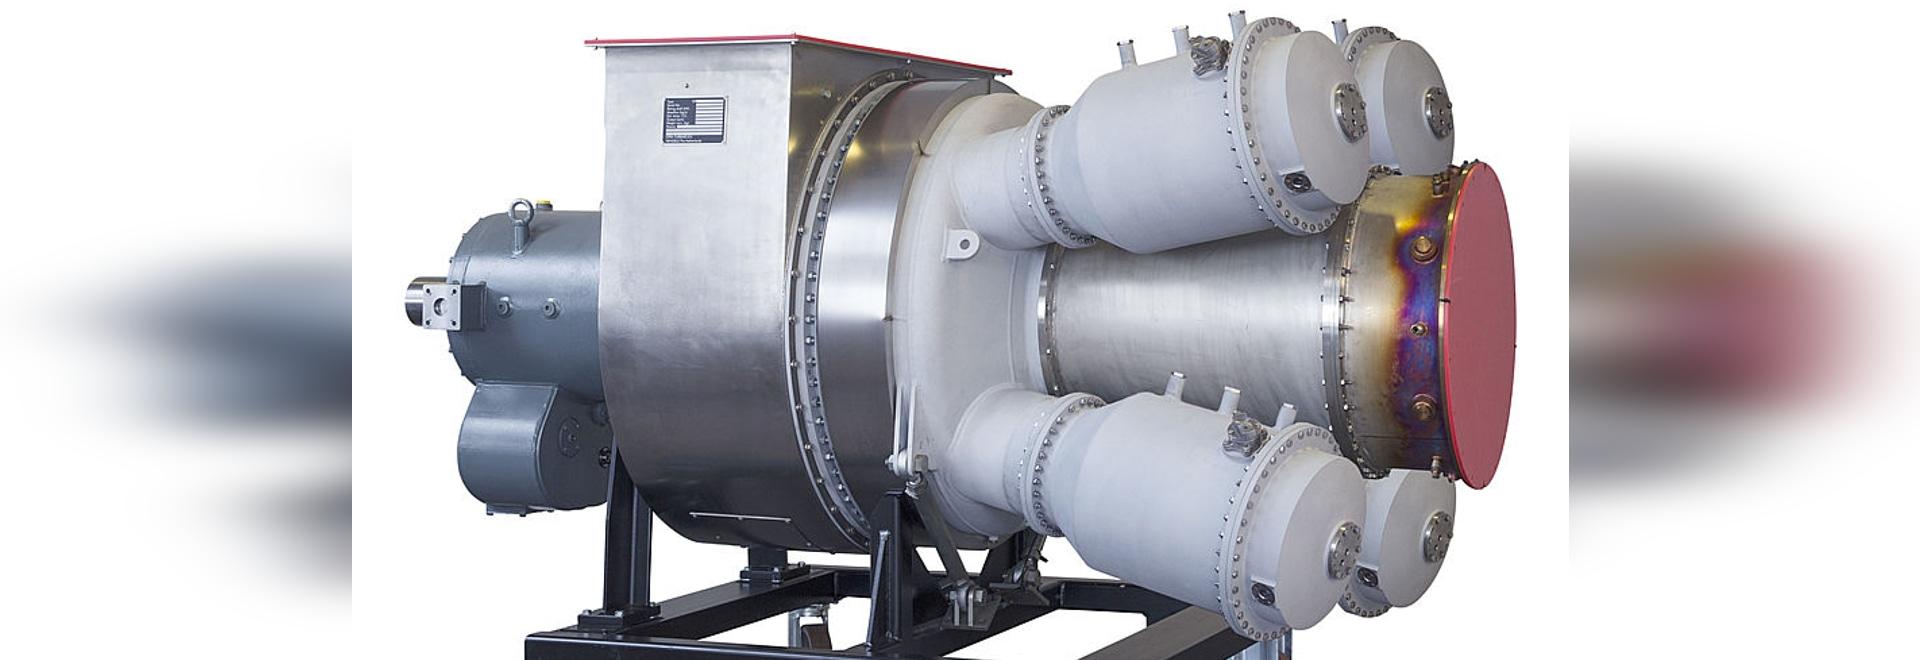 OPRA Turbines Introduces the OP16-3C.